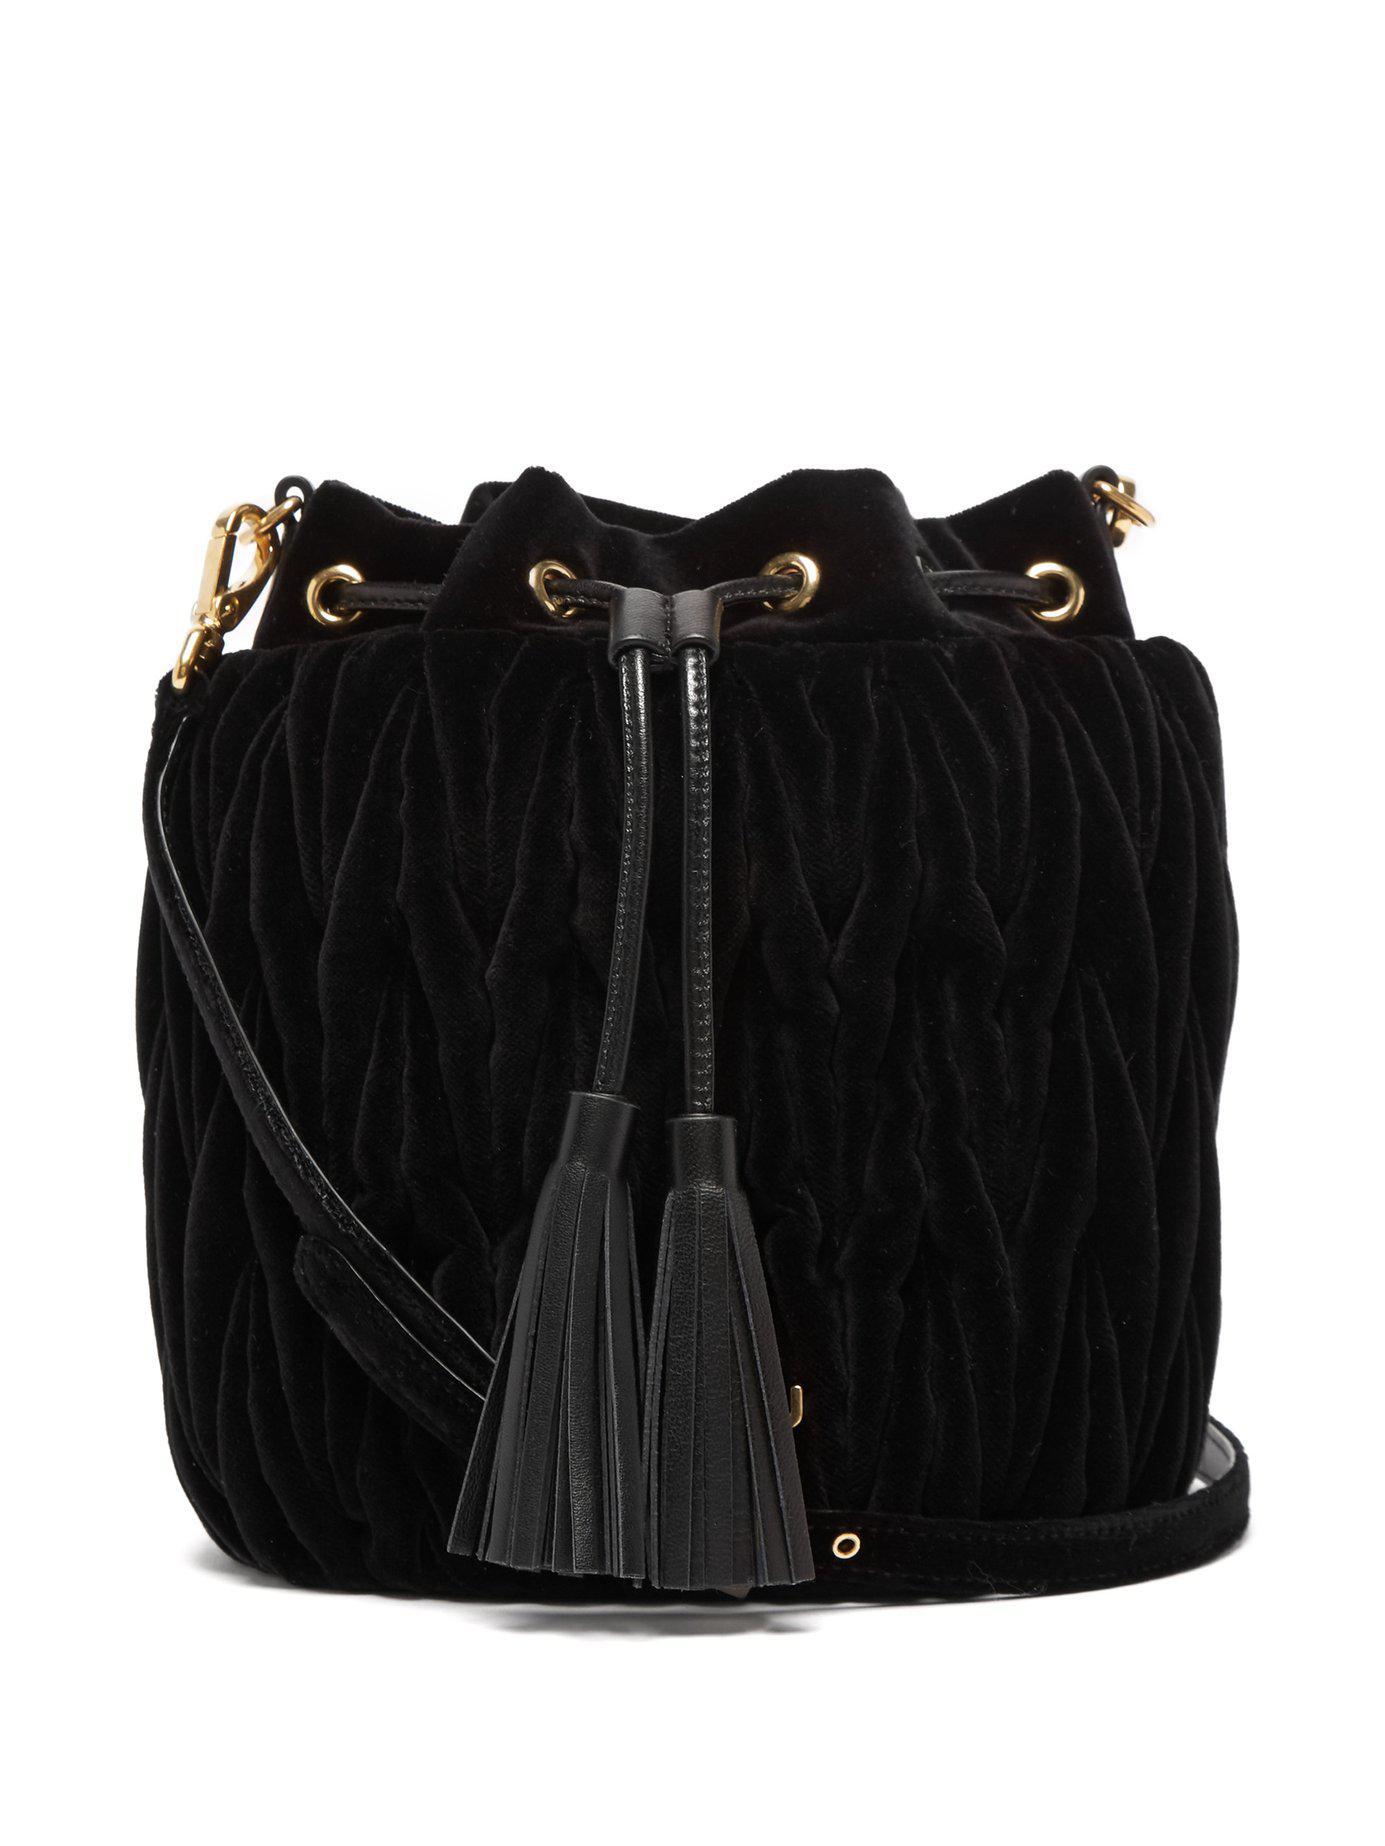 2535ae437f81 Miu Miu - Black Matelassé Velvet Bucket Bag - Lyst. View fullscreen